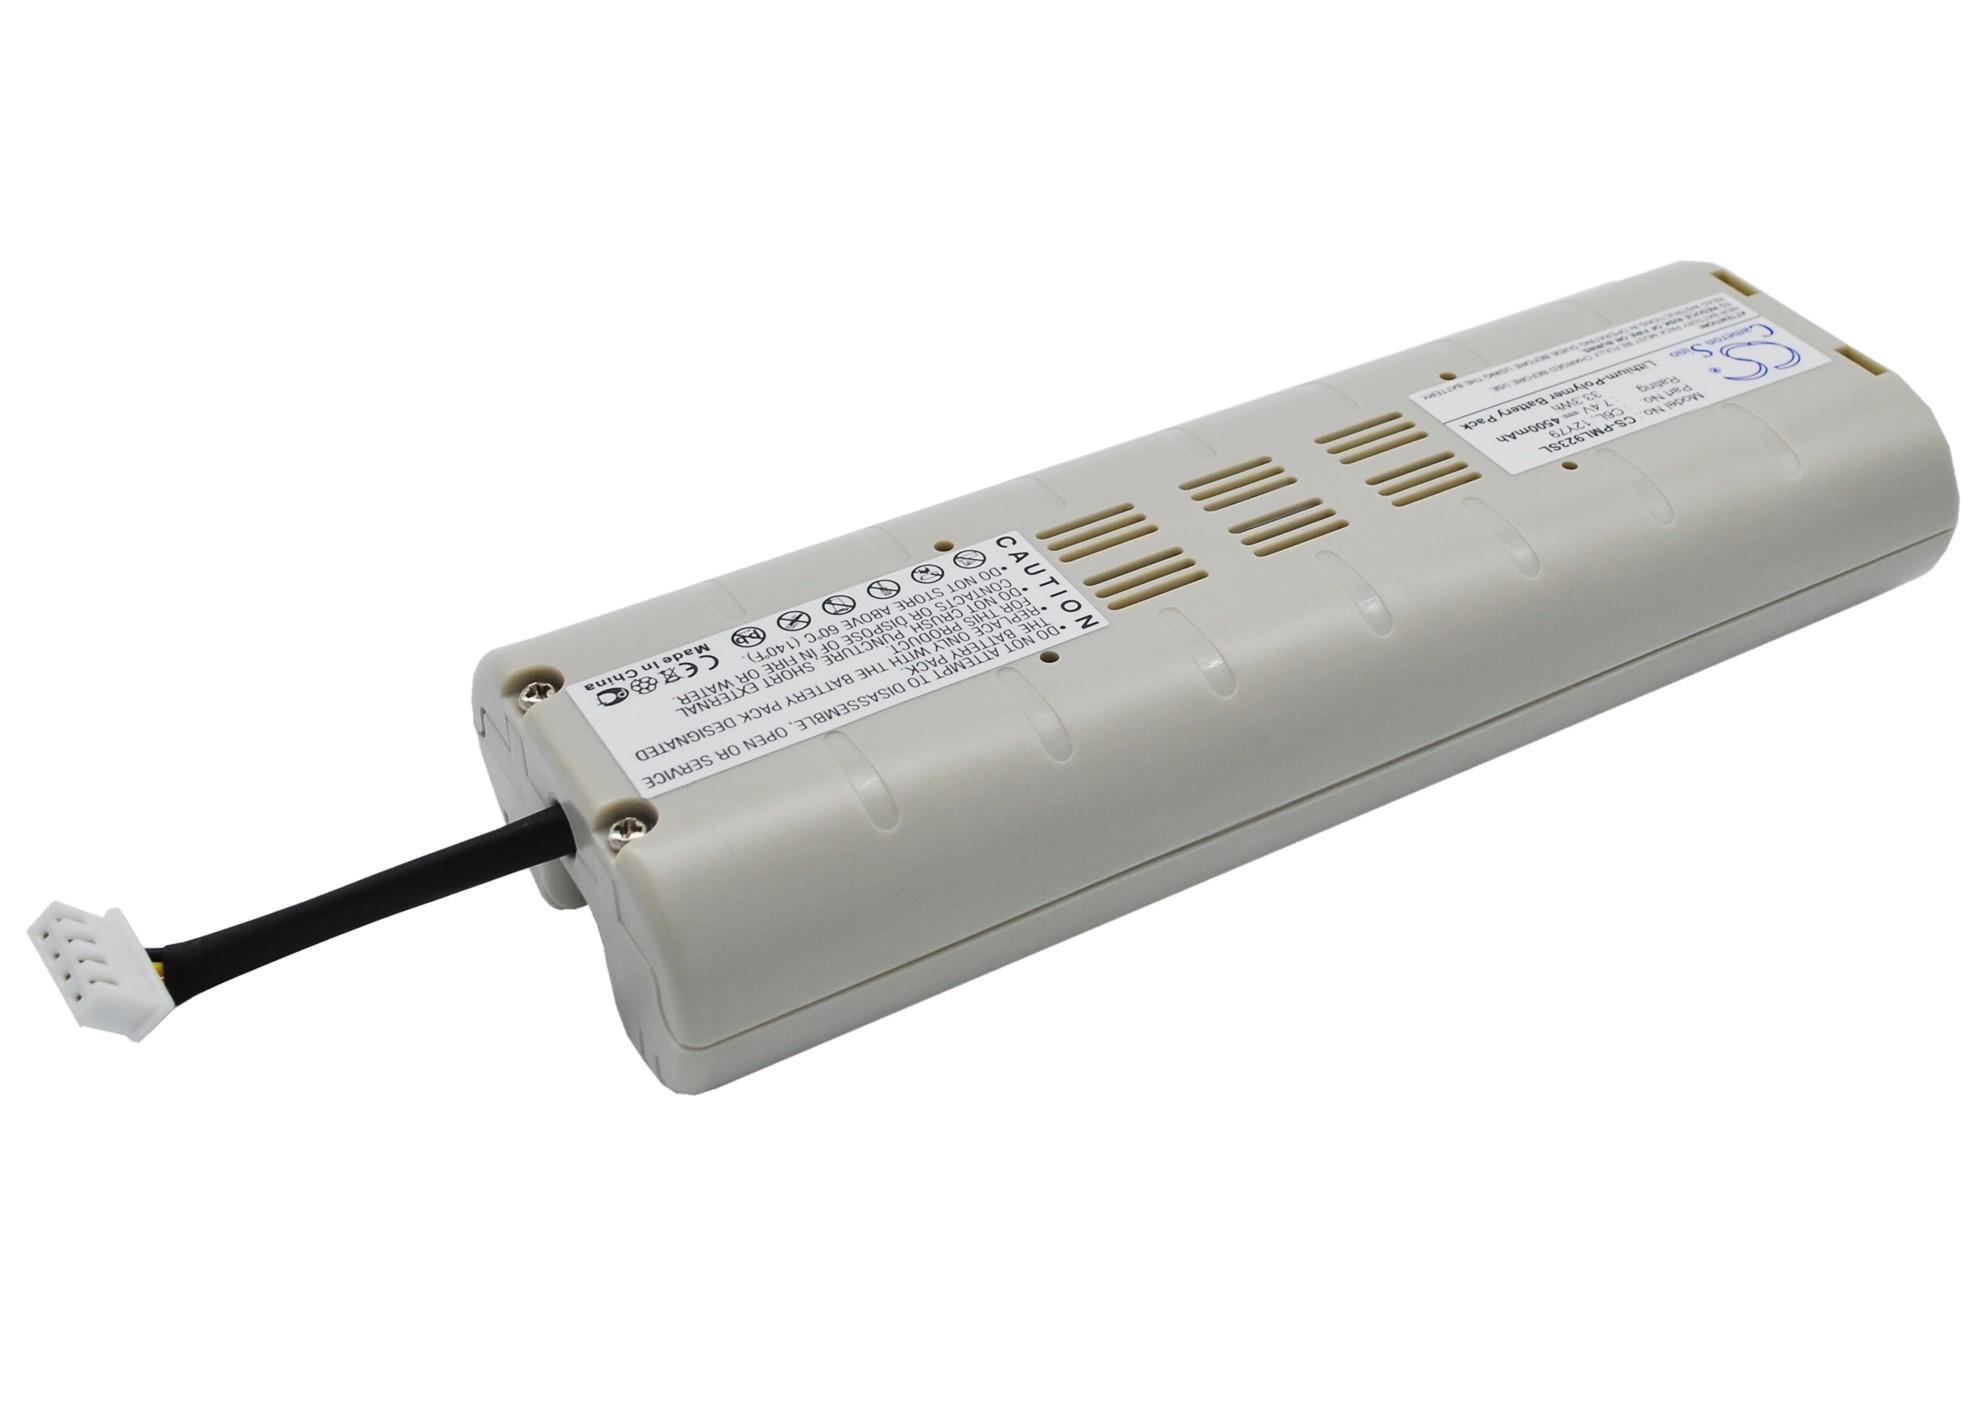 Cameron Sino baterie do digitálních rádií pro PURE EVOKE-3 7.4V Li-Polymer 4500mAh šedá bílá - neoriginální